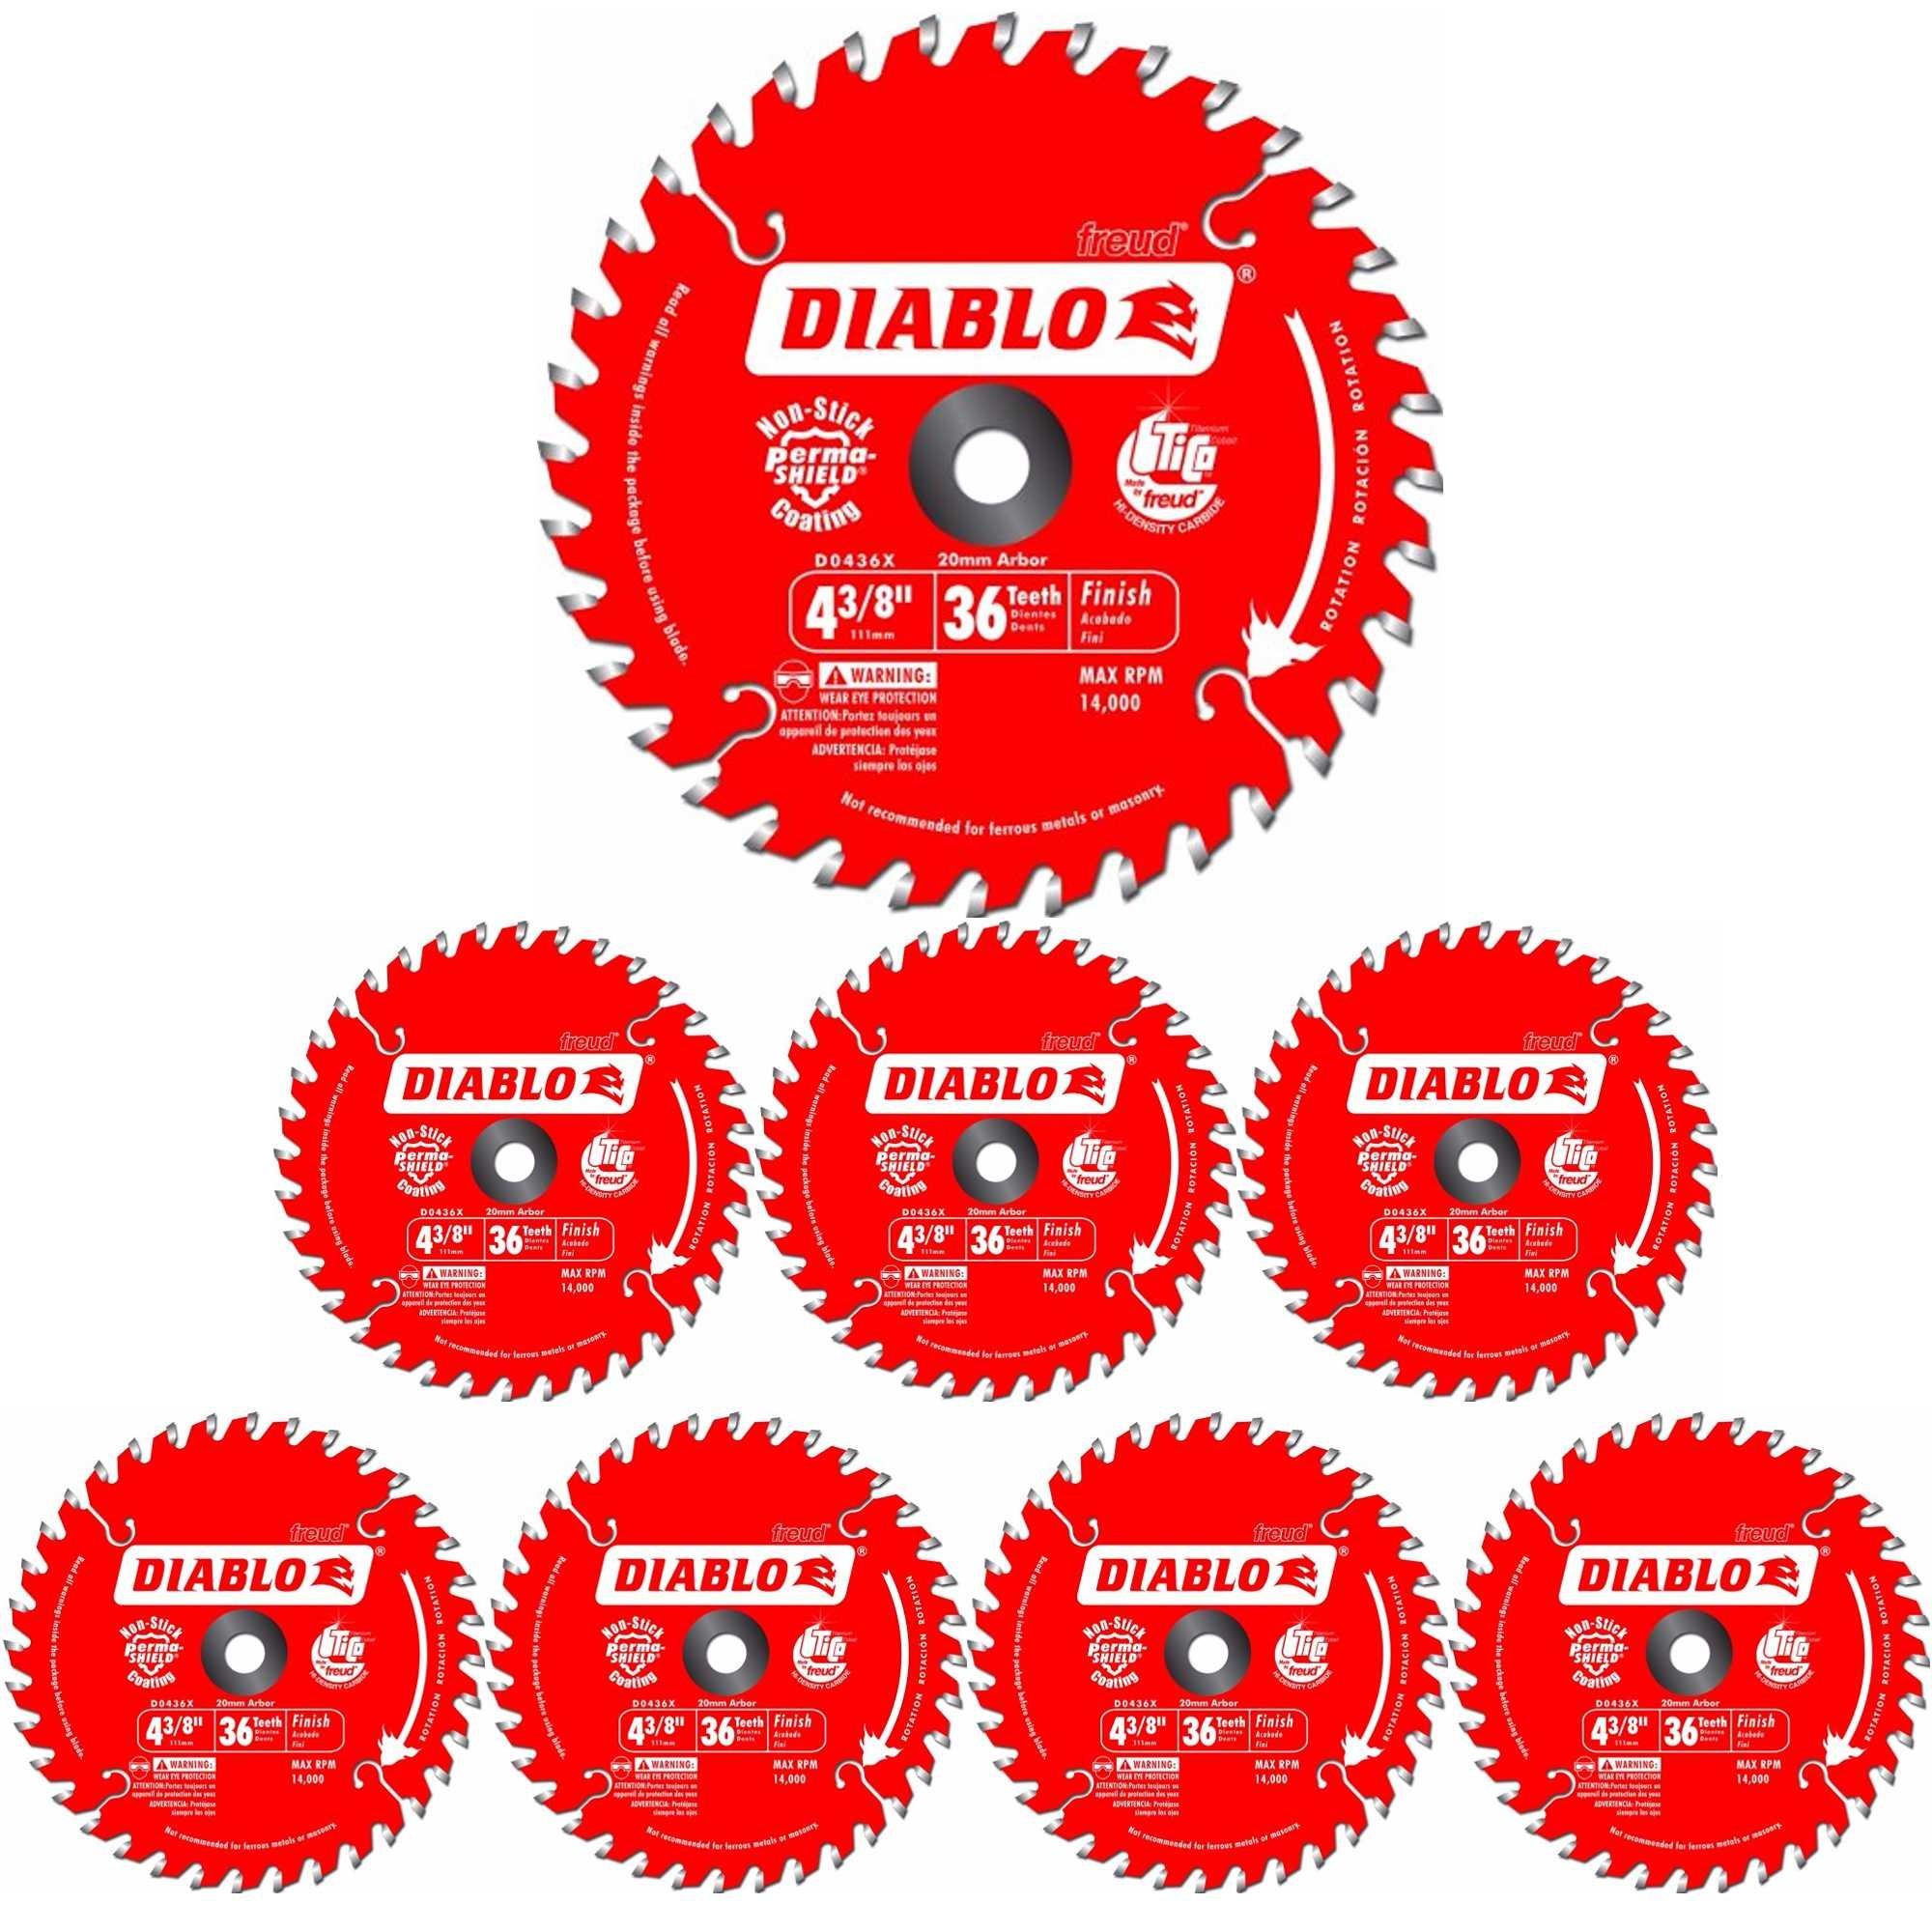 8 Hojas de Sierra DIABLO D0436X 4 3/8 x 36T ATB 20 Eje milim